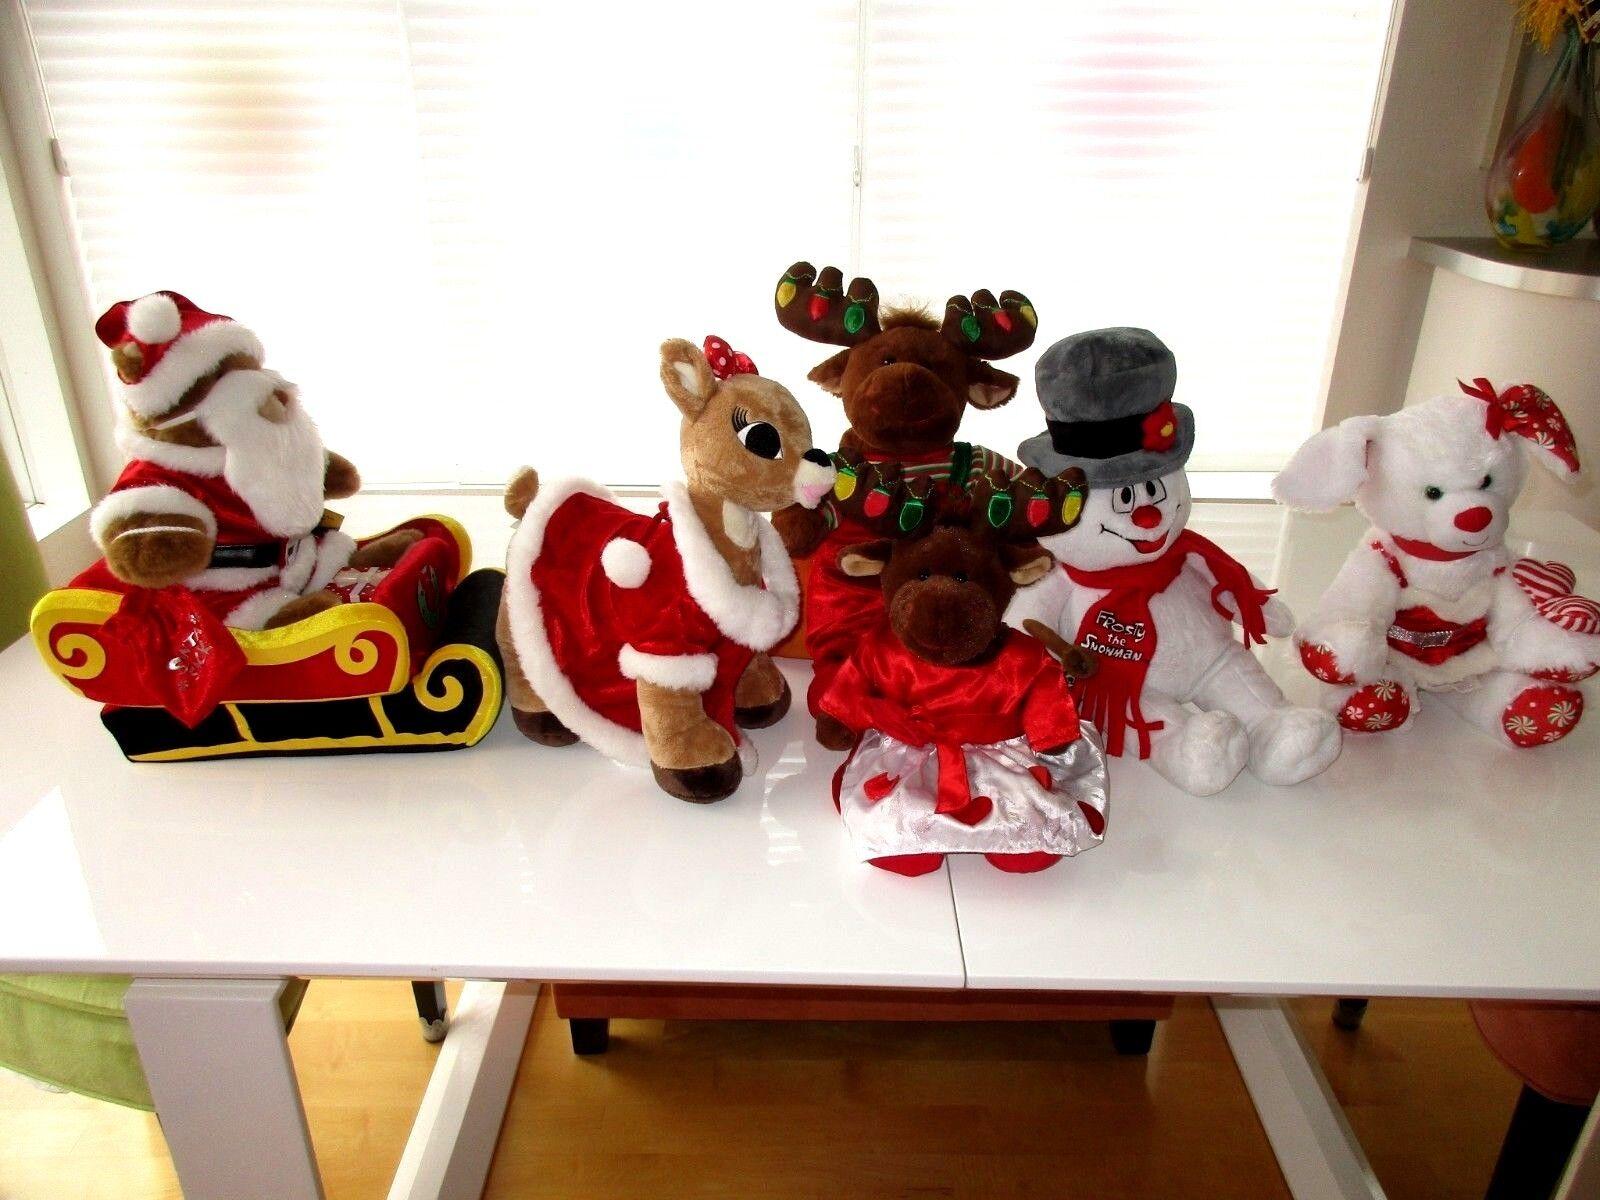 Build a Bear-Christmas-Santa's Sleigh-Reindeer-Mr & Mrs Moose-Frosty-Holiday Lot